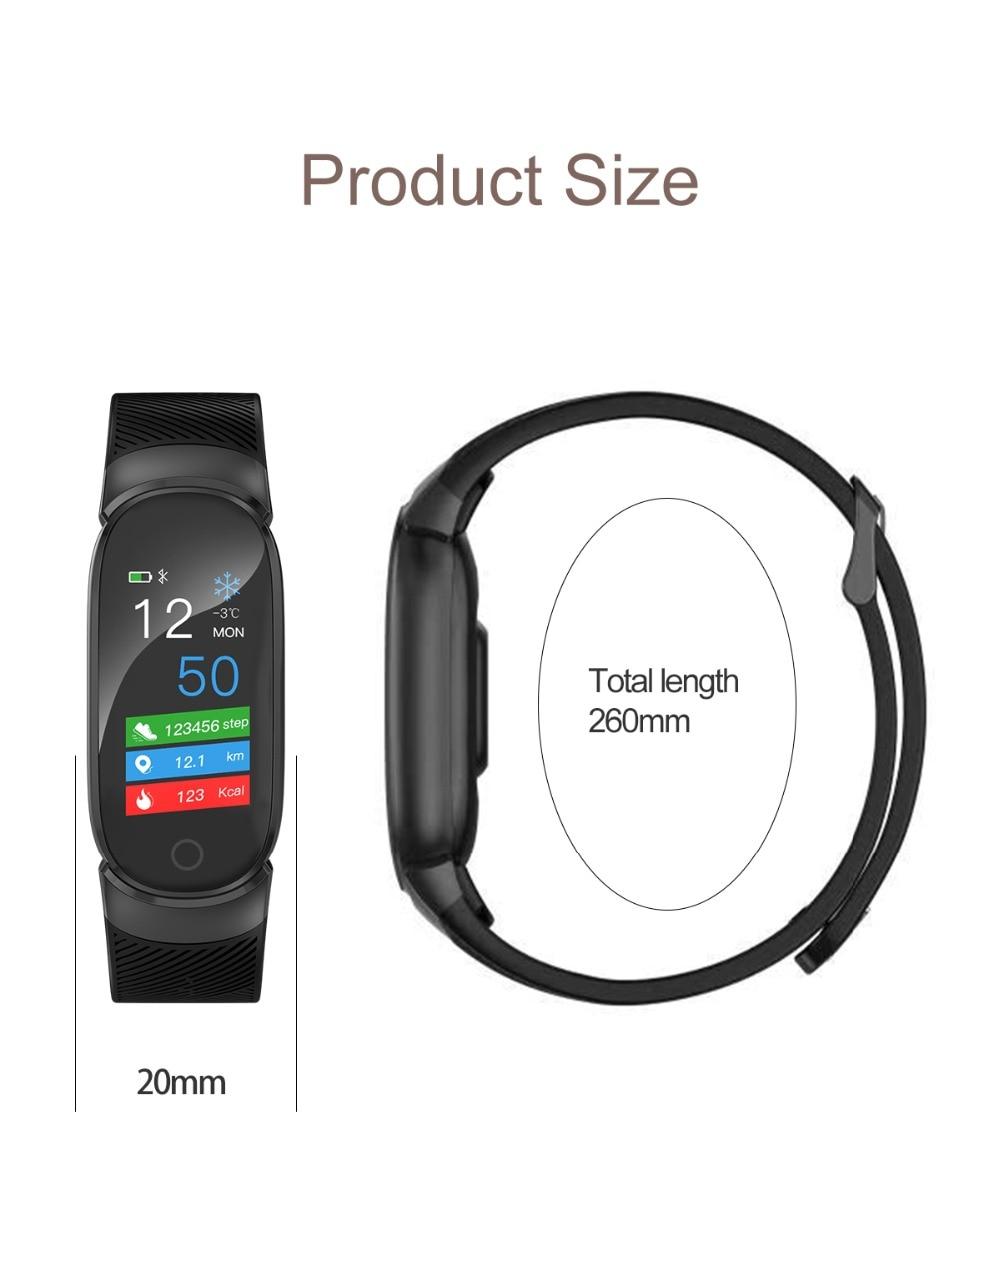 HTB1OvbvdUCF3KVjSZJnq6znHFXaV QW16 Waterproof Smart Bracelet Smart Band IP67 Heart Rate Fitness Tracker Blood Pressure smart watch